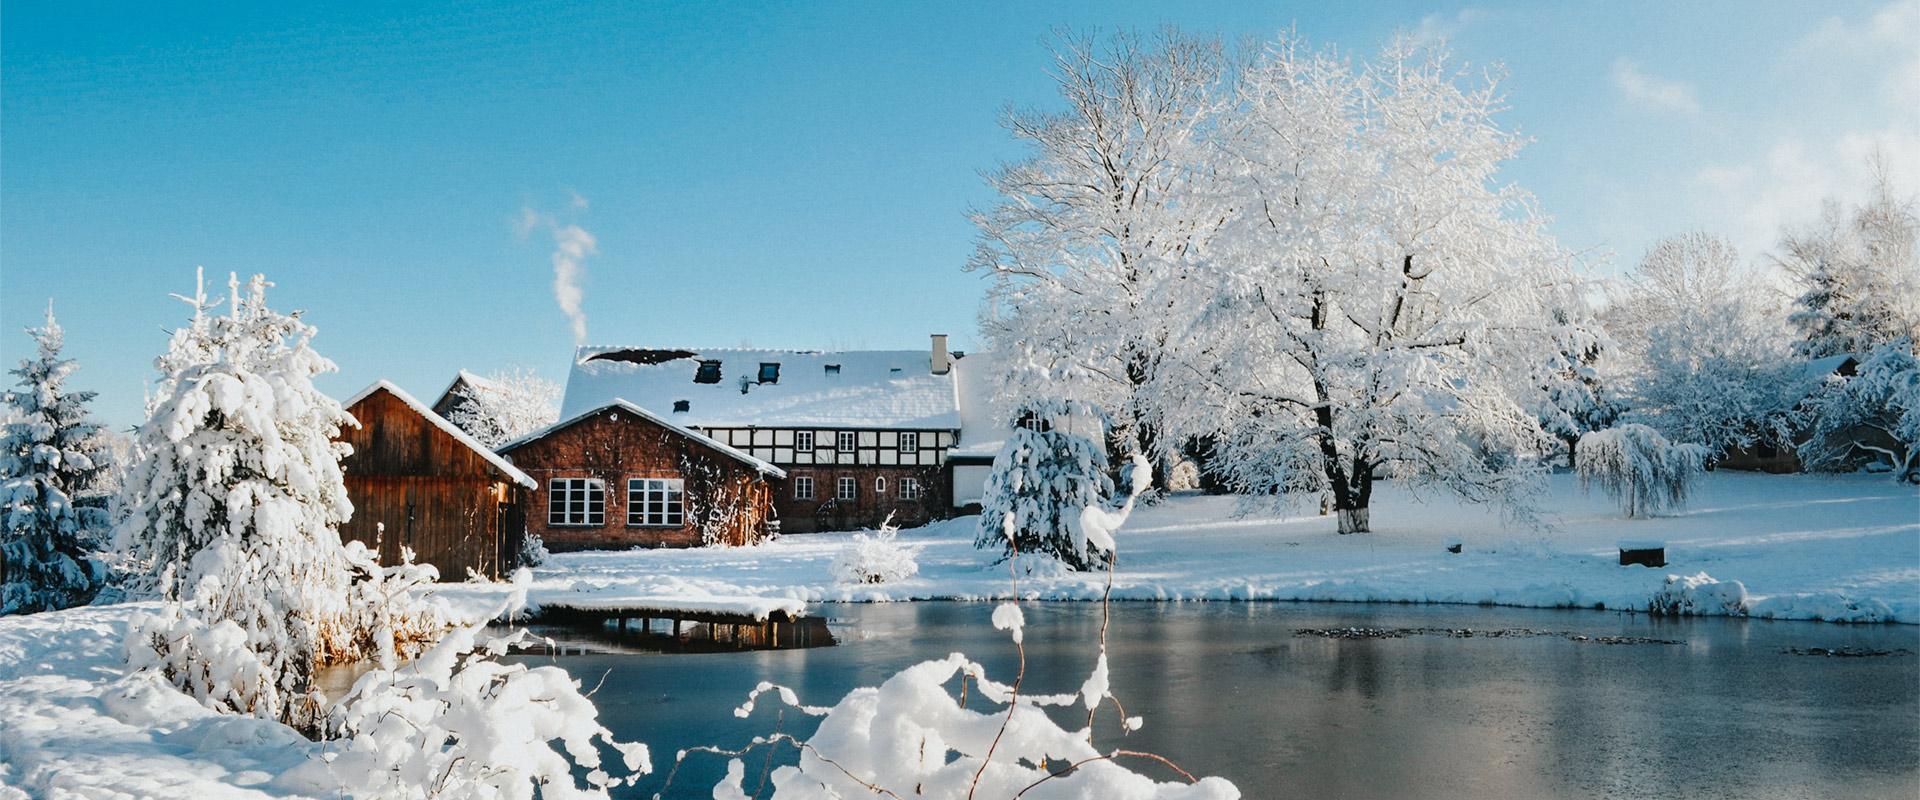 Ferie zimowe w Sudetach